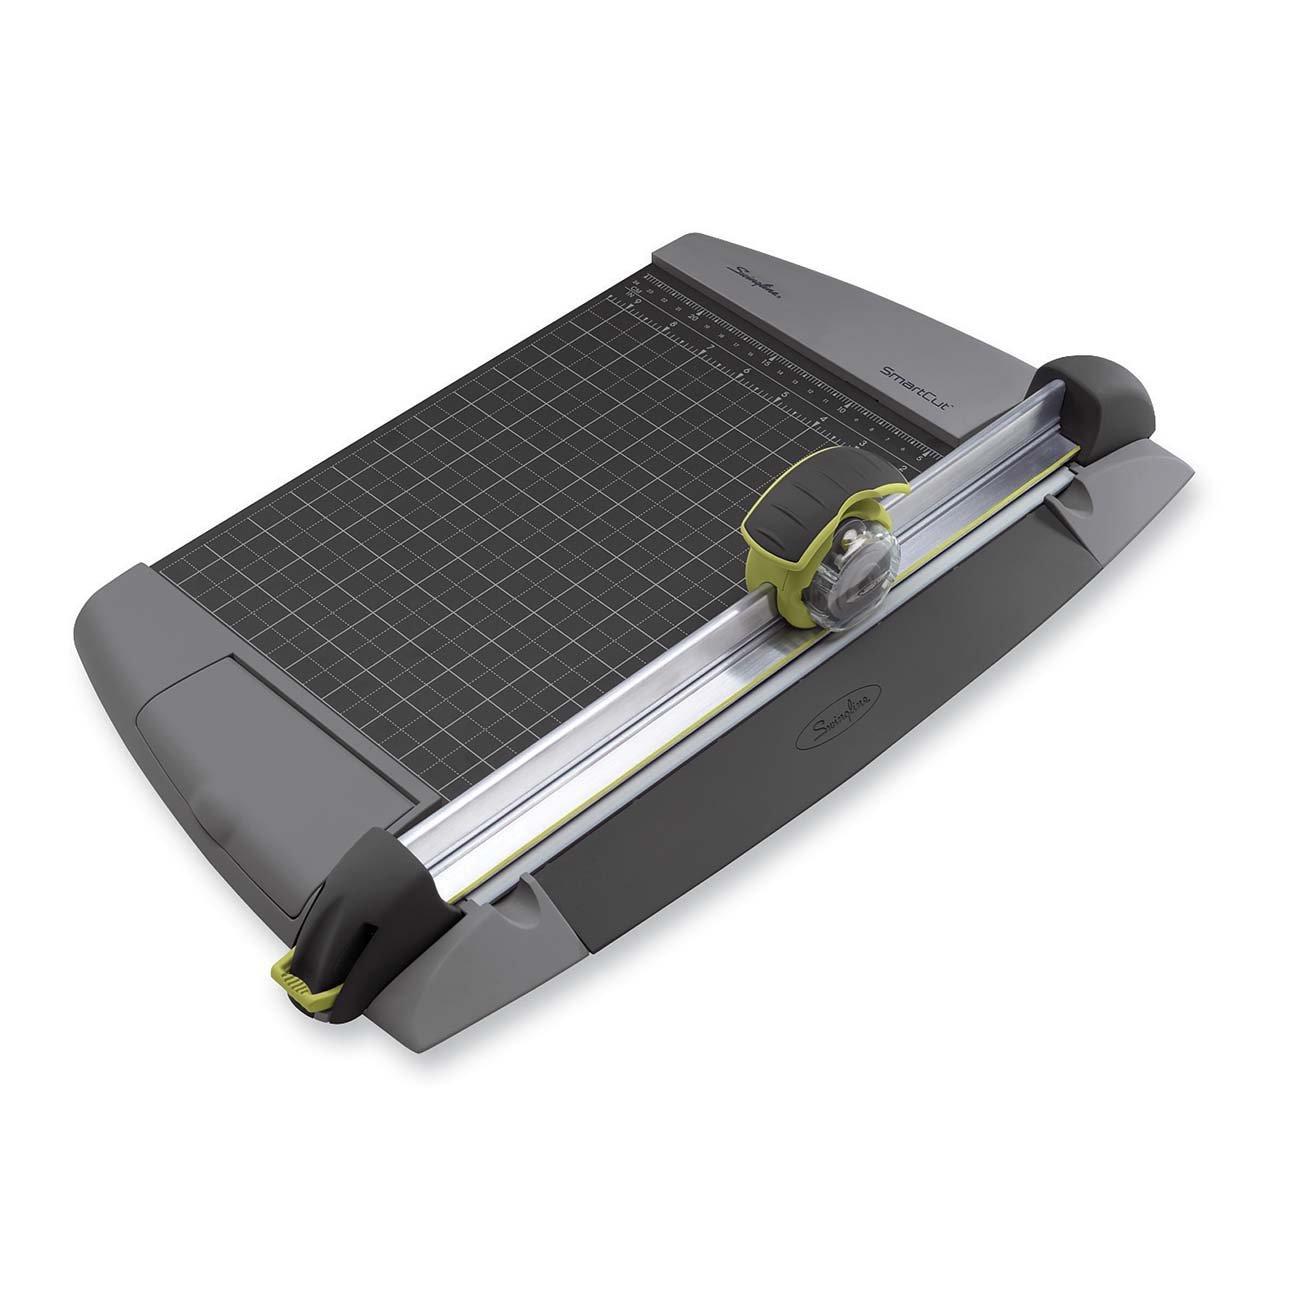 Swingline Paper Trimmer / Cutter, Rotary, 12'' Cut Length, 15 Sheet Capacity, SmartCut EasyBlade Plus (8912)